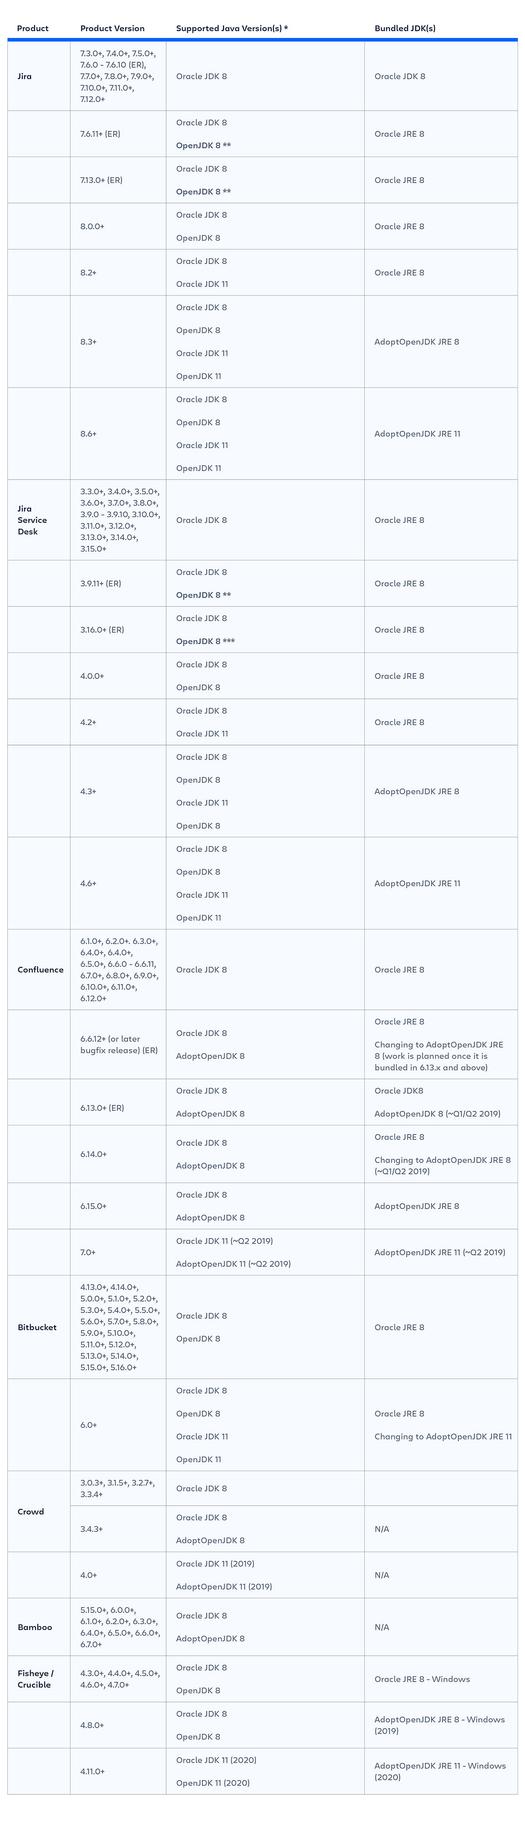 SMT-2493_Update_Table_JavaCommunityPost_600x2085@2x.png